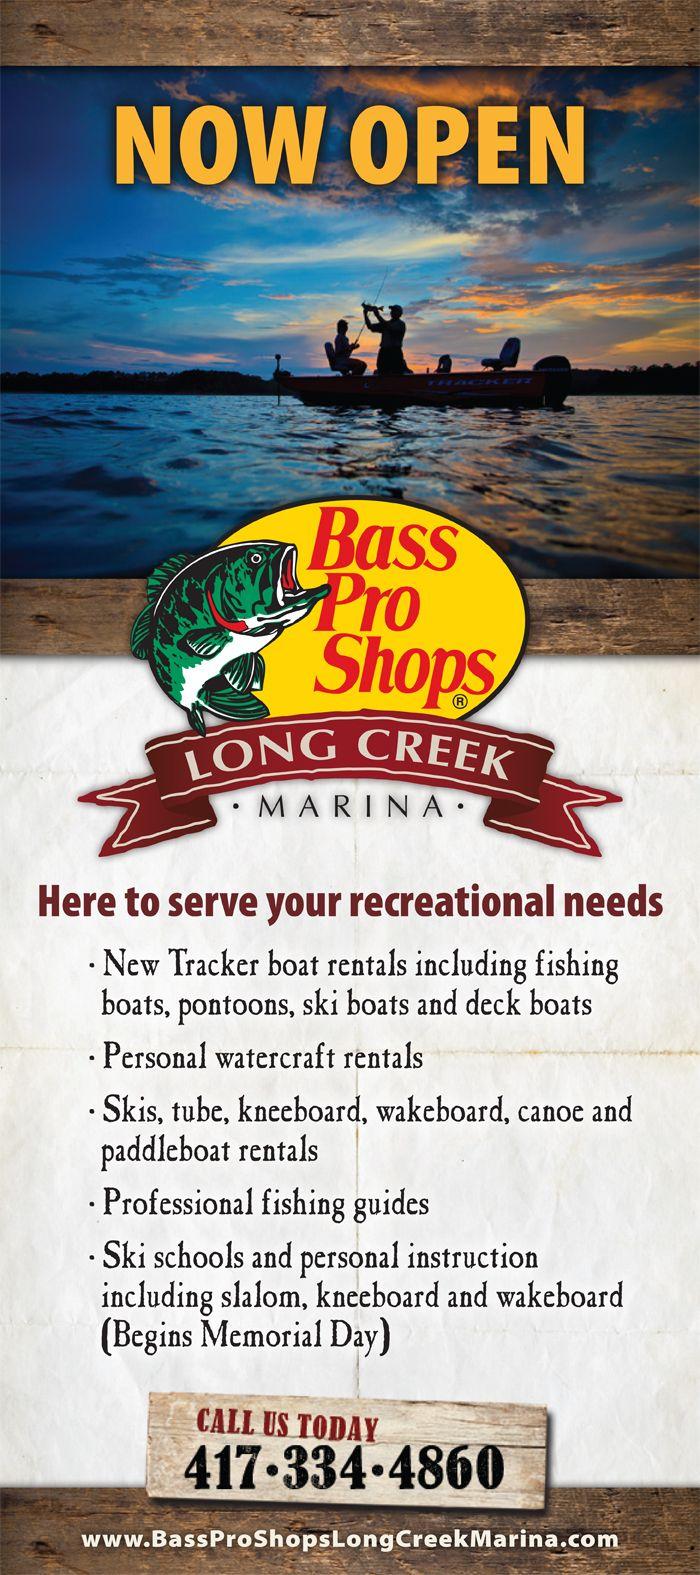 Bass Pro Shops Long Creek Marina Branson Missouri Resorts Big Cedar Branson Missouri Vacation Lodging Branson Vacation Vacation Trips Branson Missouri